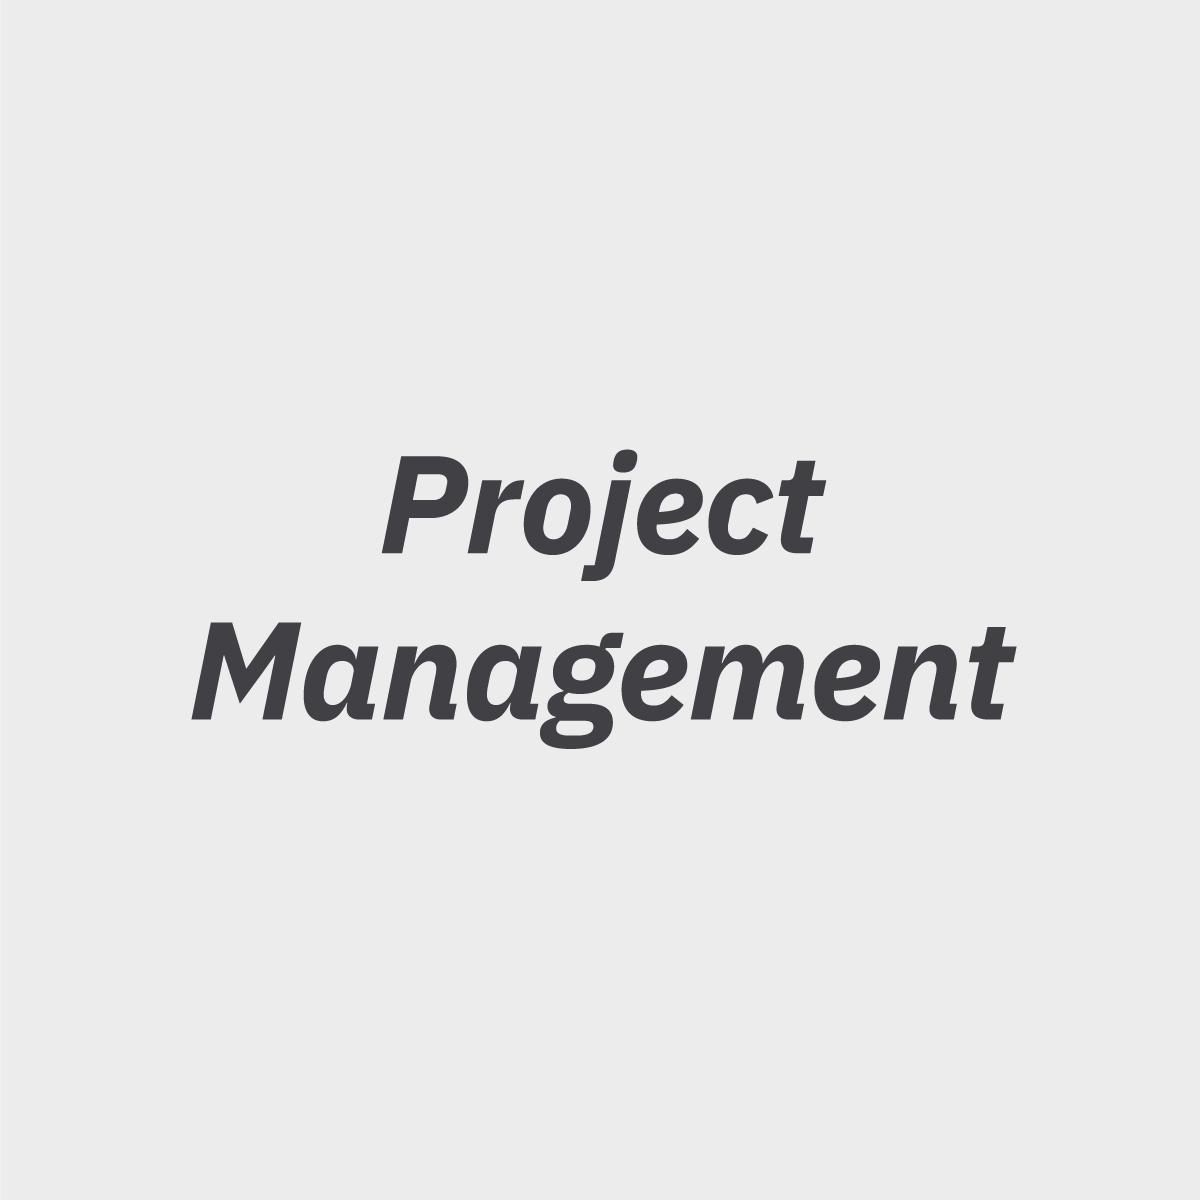 Get Dudley, Orlando, FL & New York, NY, Portfolio, Helene Dudley, Project Management